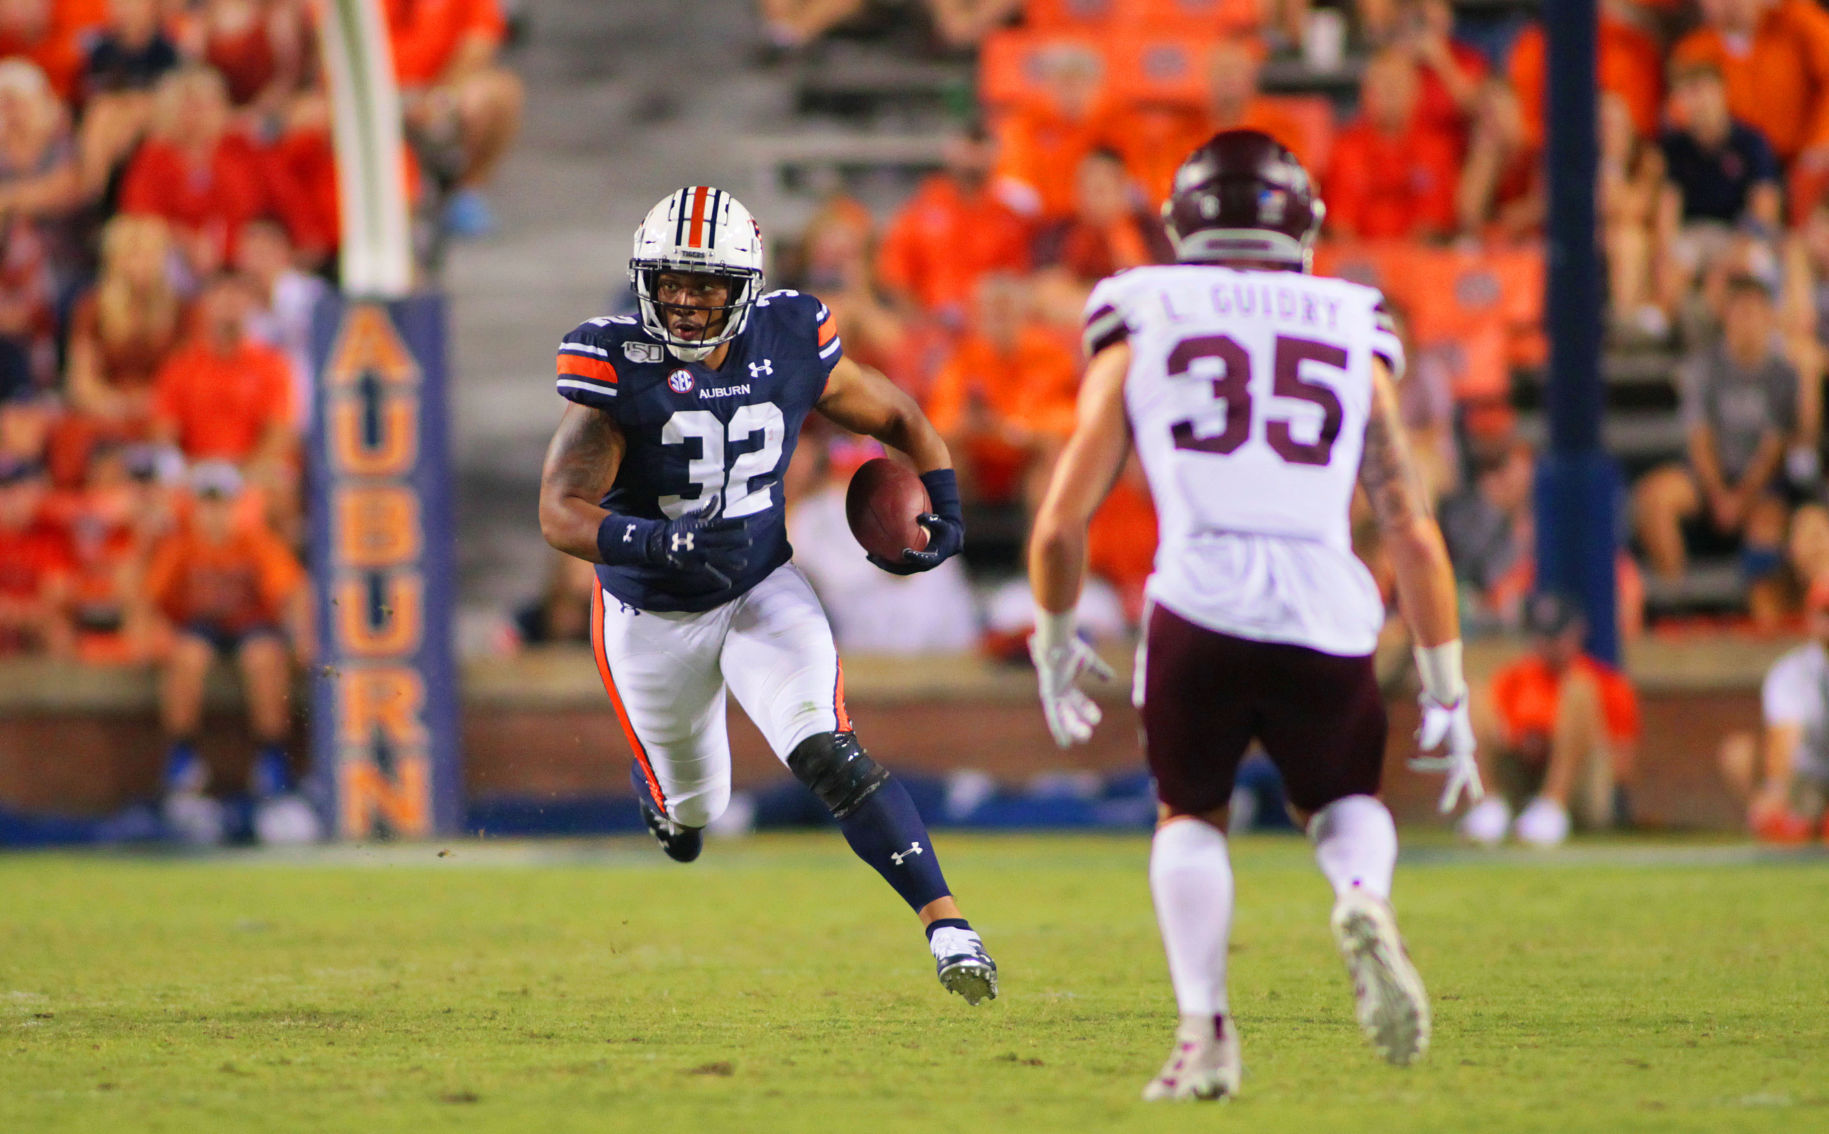 Report Malik Miller Won t Return To Auburn Football Auburn University Sports News Oanow com